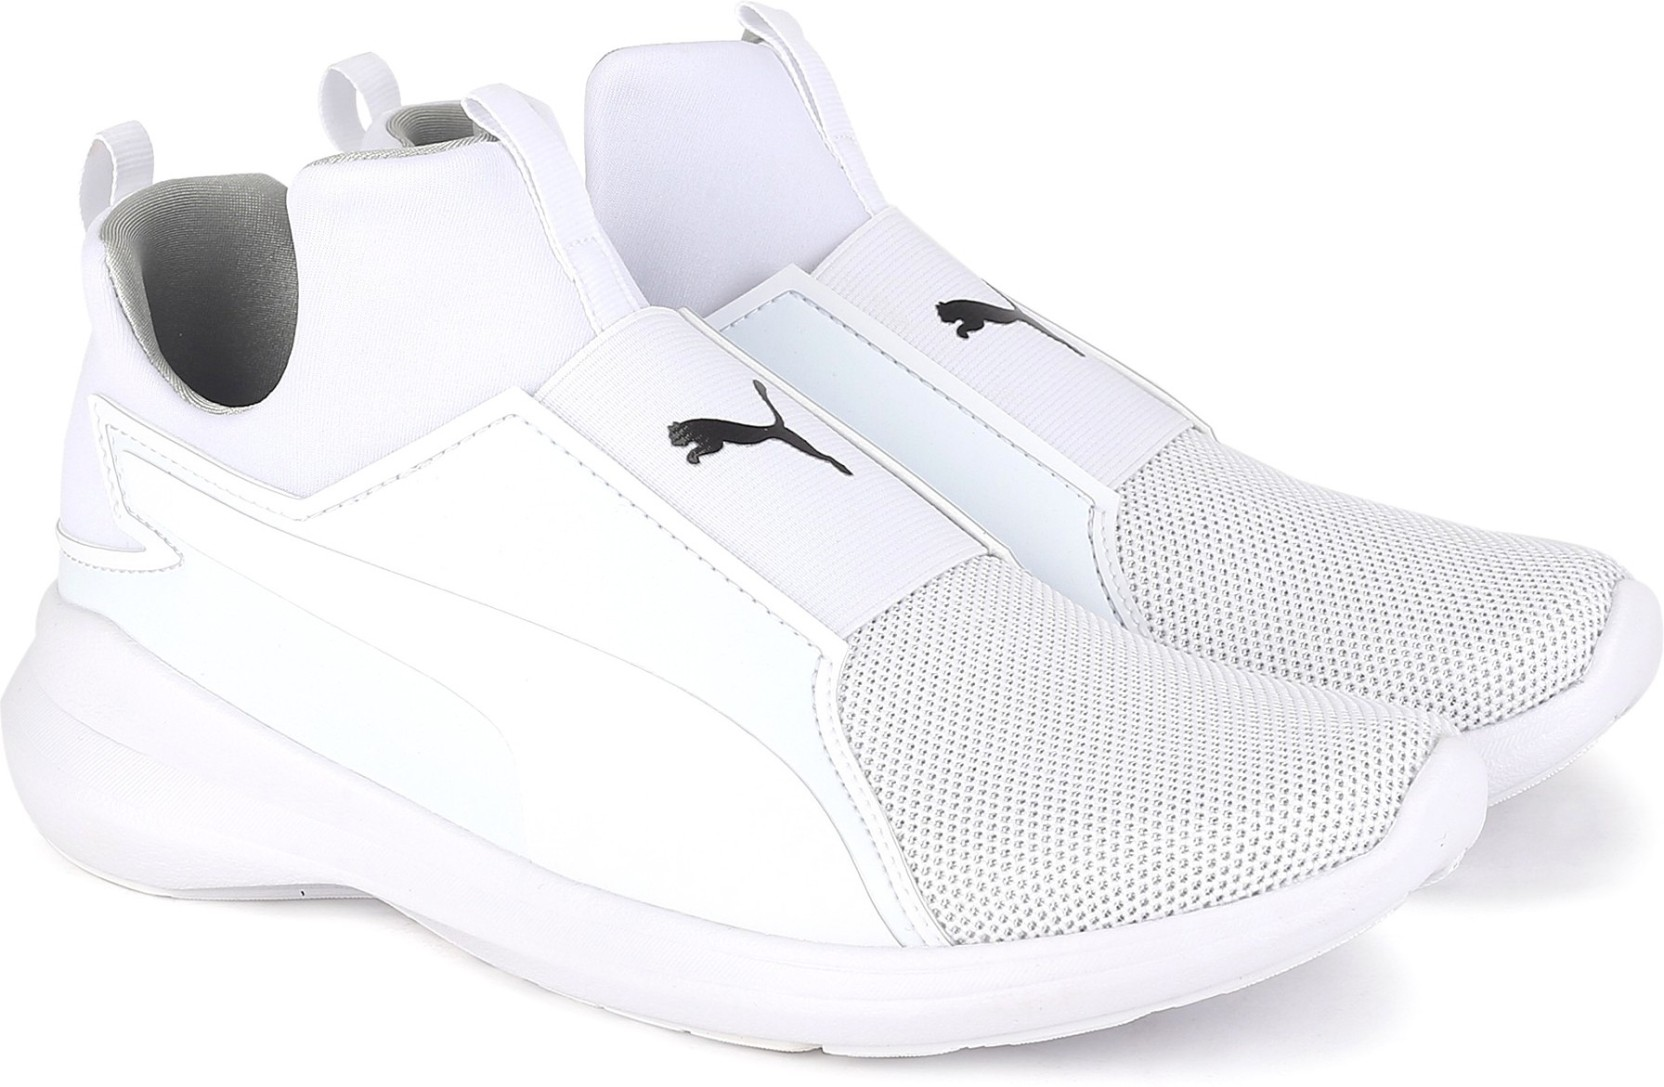 7a806b6ddcd4 Puma Puma Rebel Mid Core Sneakers For Women - Buy Puma White-Puma ...